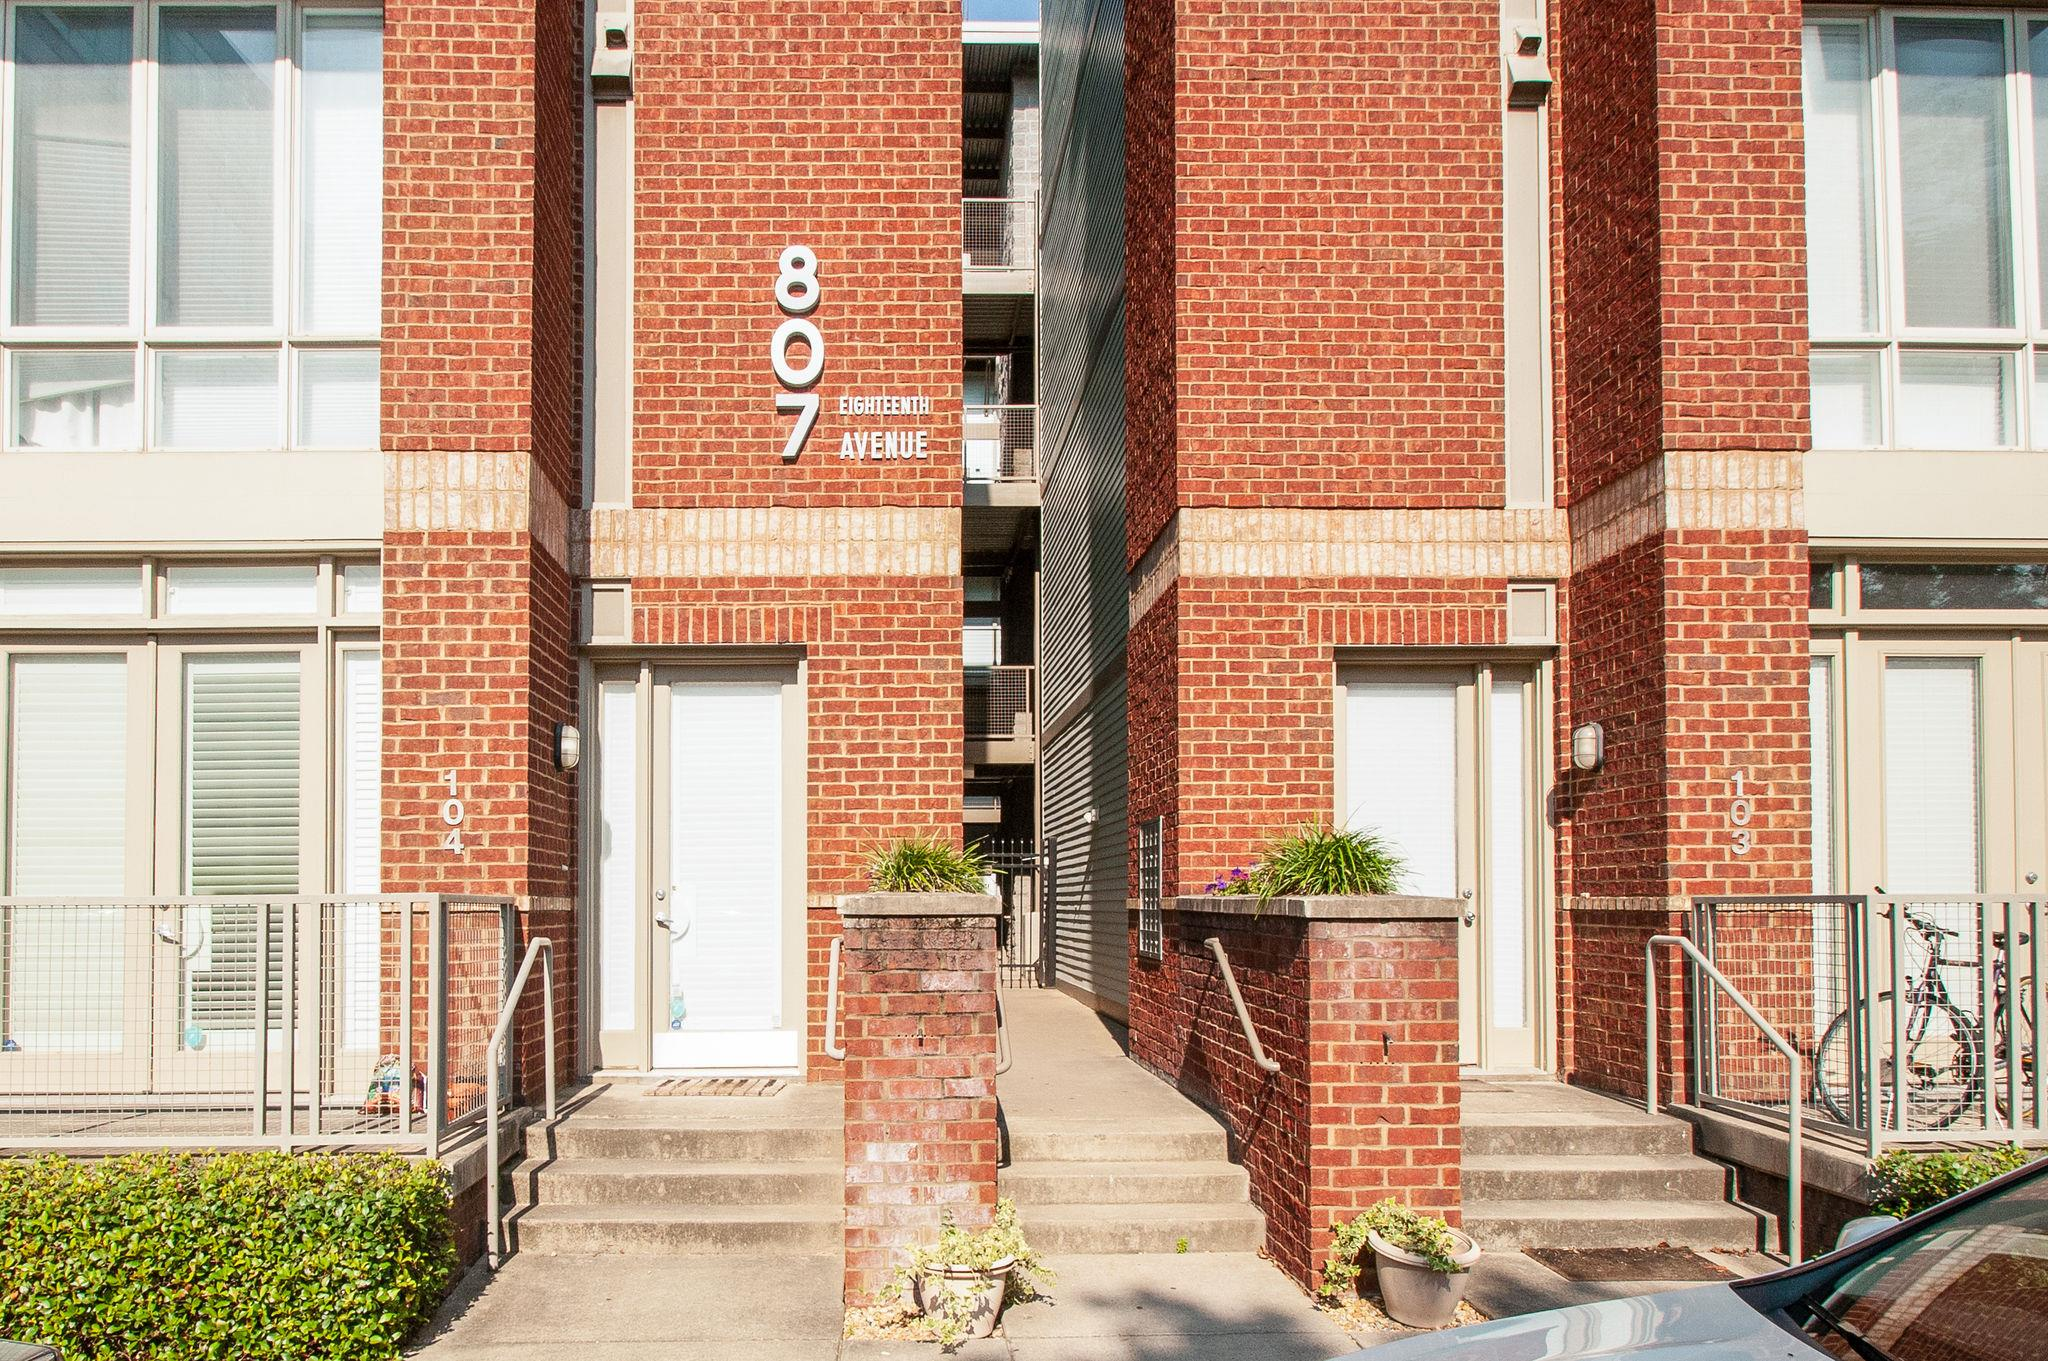 807 18Th Ave S Apt 414, Nashville, TN 37203 - Nashville, TN real estate listing